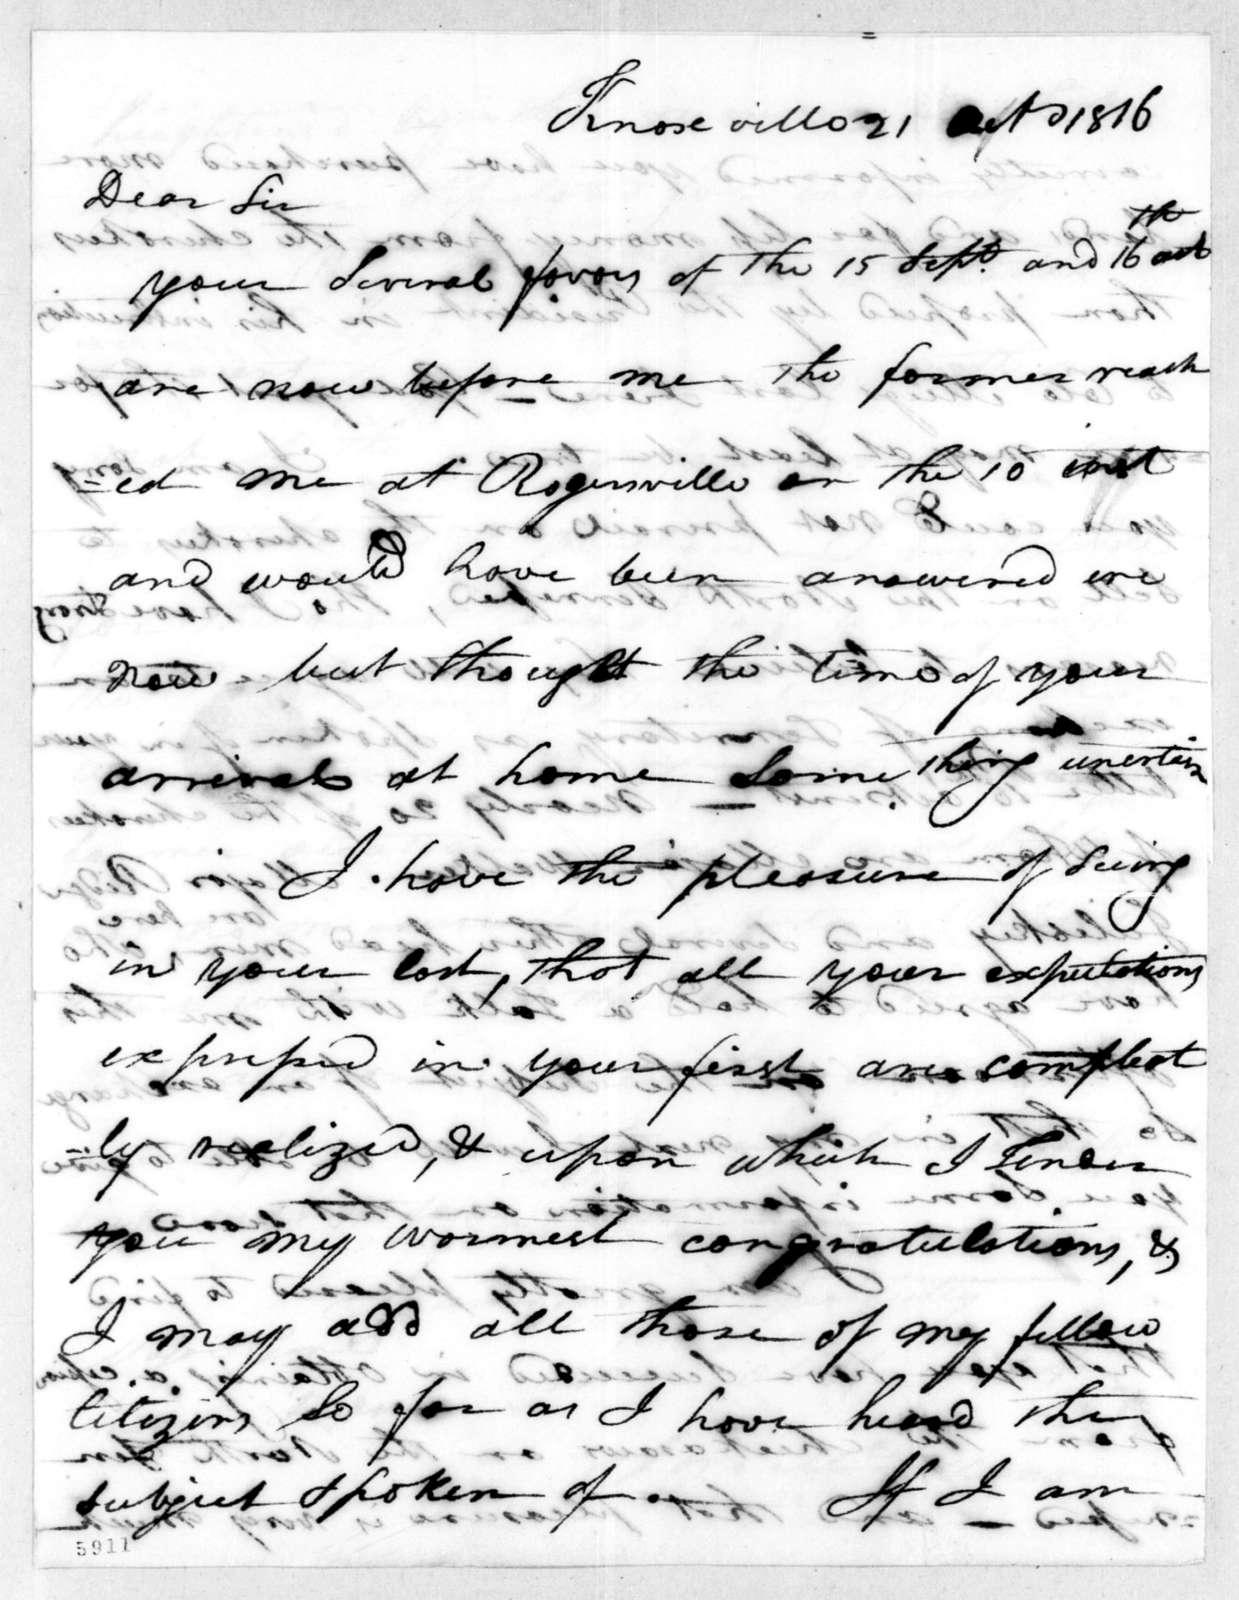 Joseph McMinn to Andrew Jackson, October 21, 1816